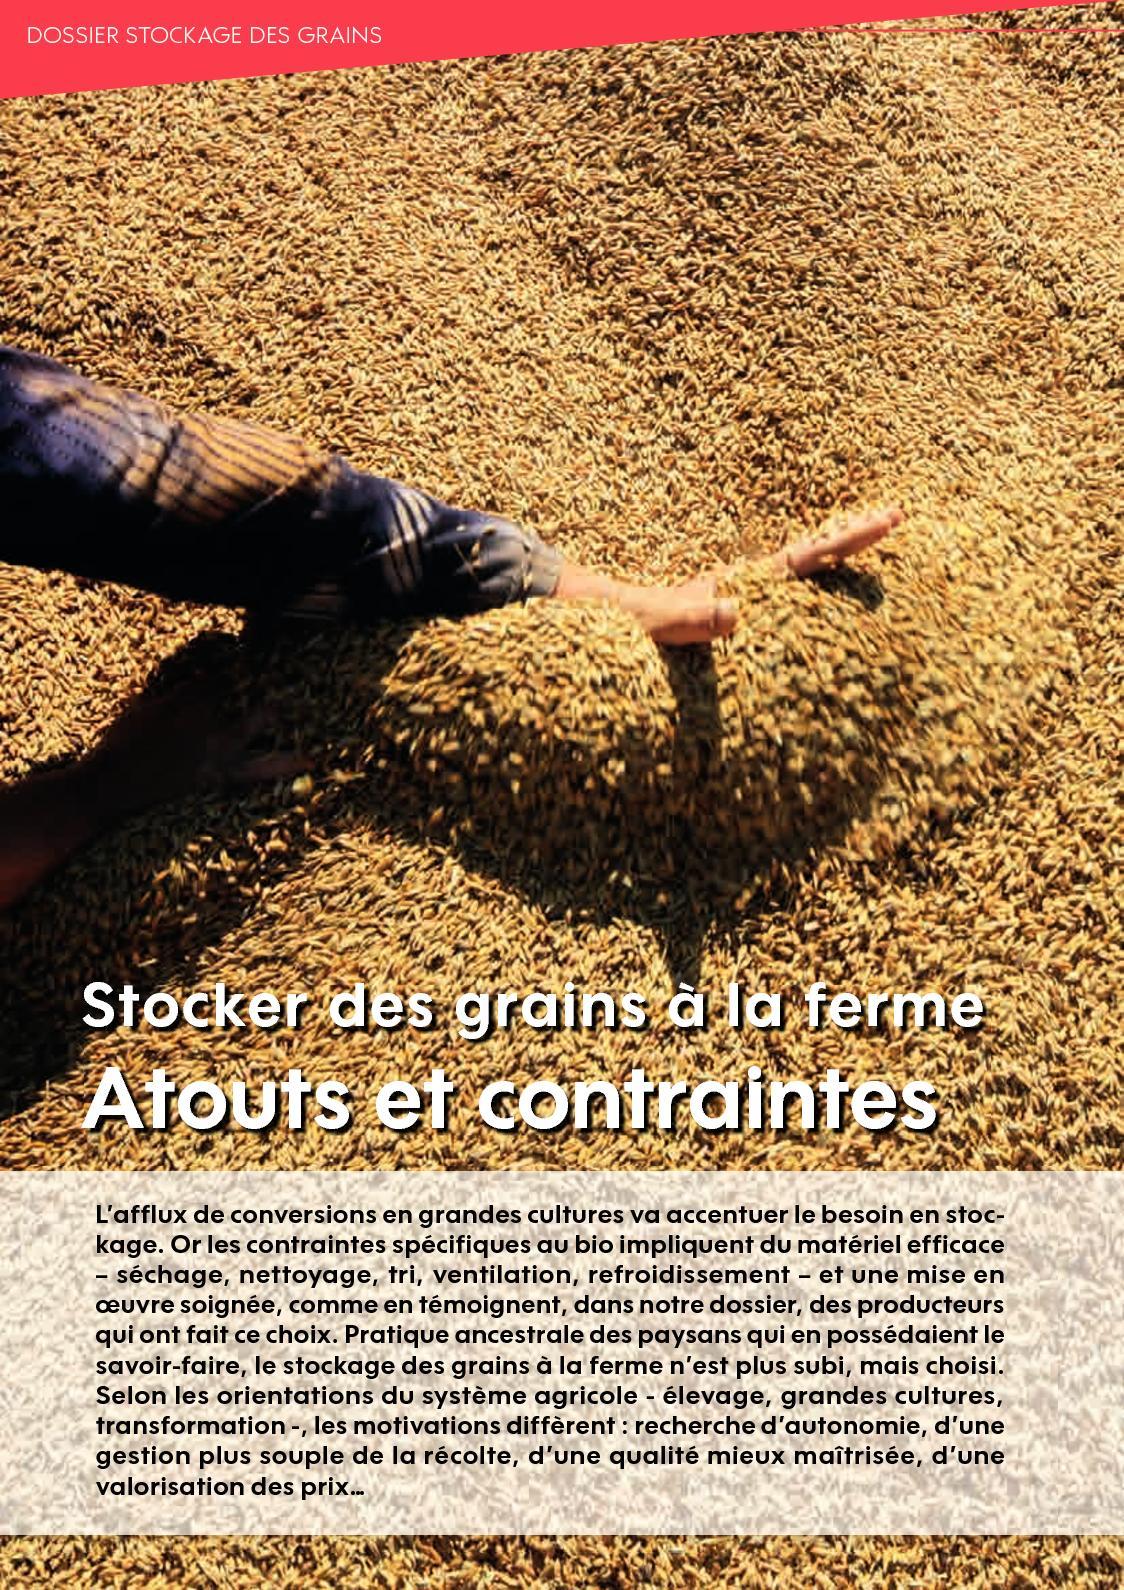 BIOFIL 105 - Dossier Stockage Grains